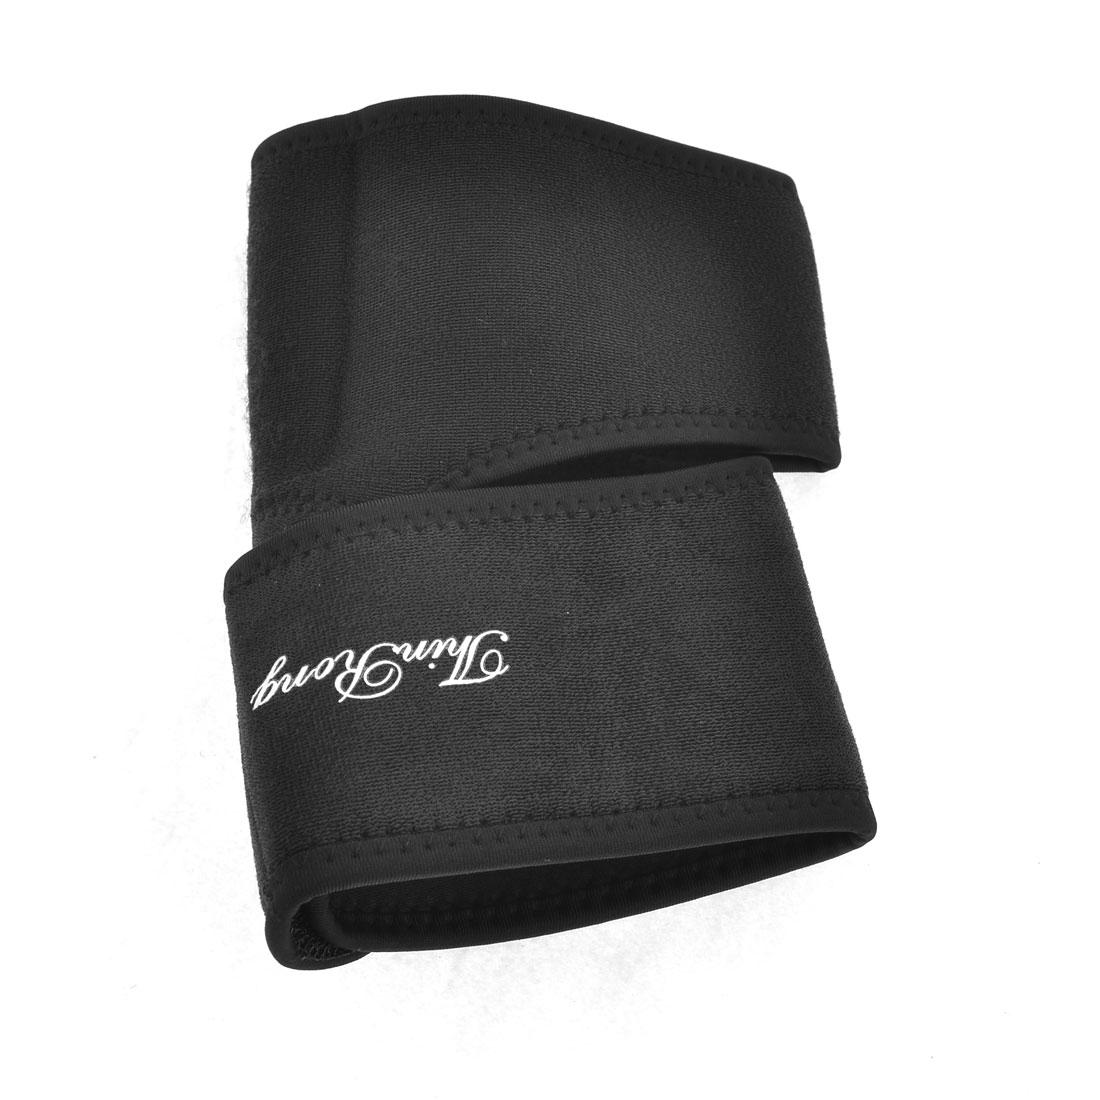 Sporter Athlete Detachable Closure Soft Elastic Eblow Arm Support Black